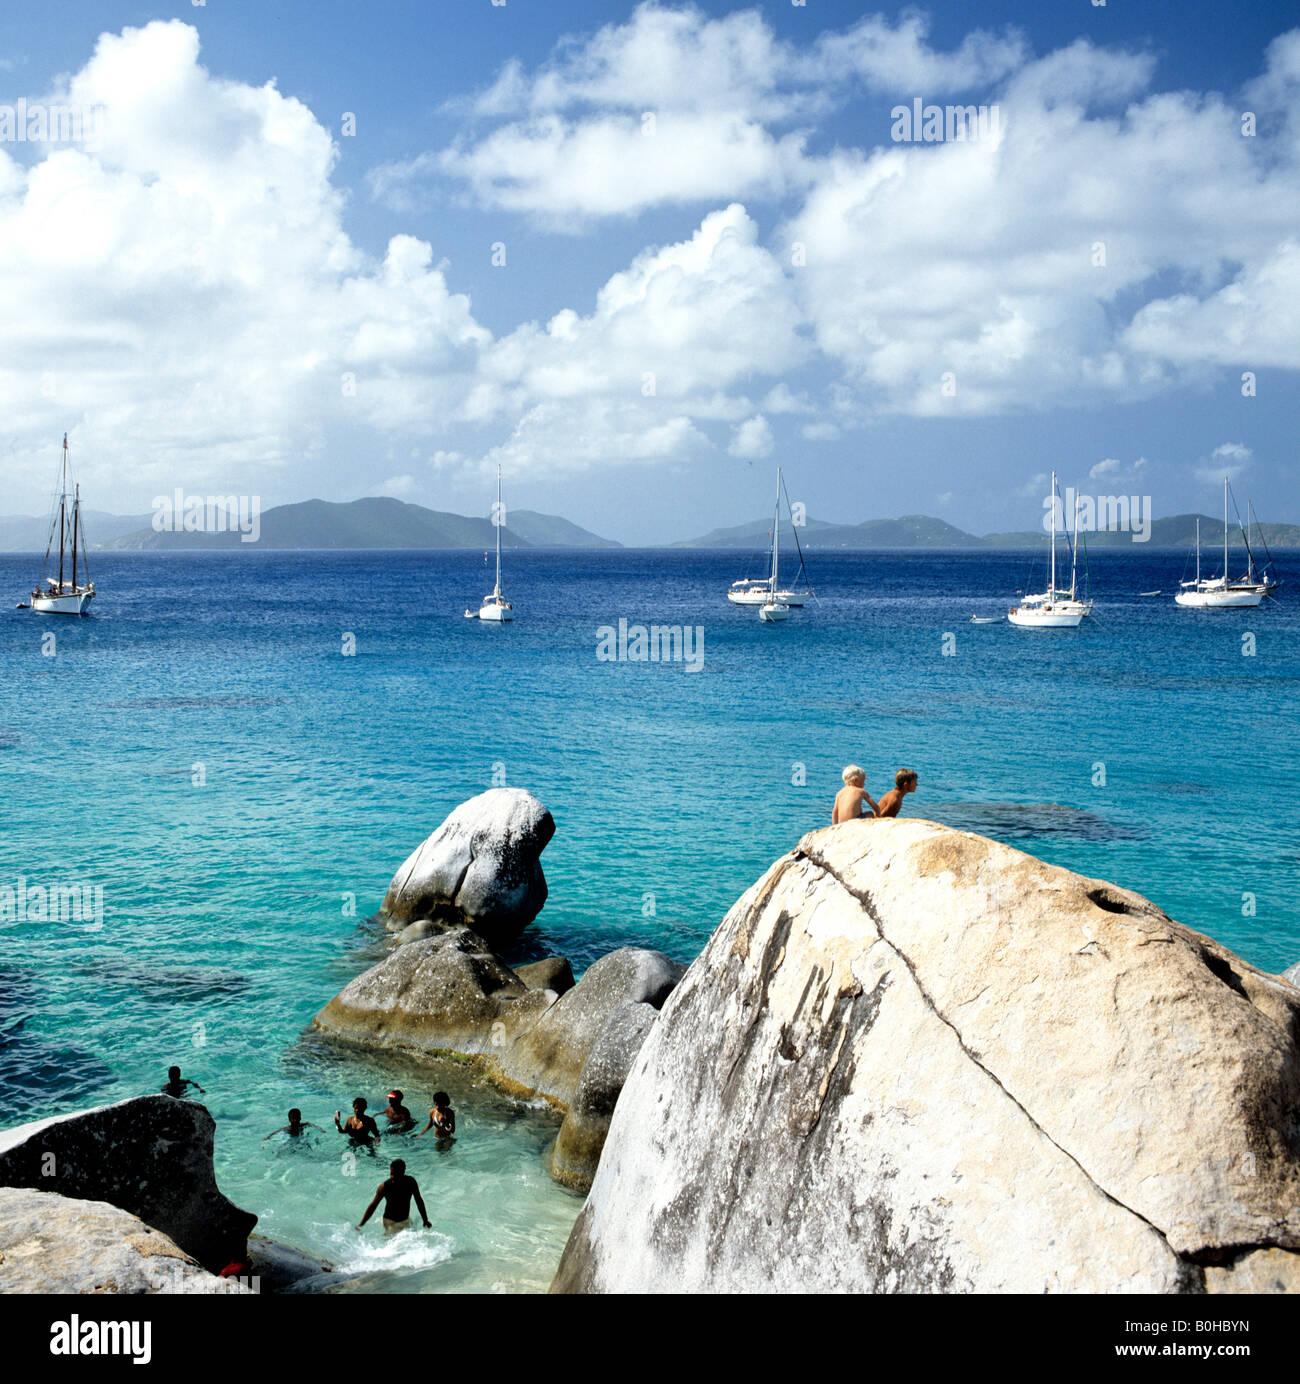 Felsformation, Virgin Gorda, Britische Jungferninseln, kleine Antillen, Karibik Stockbild